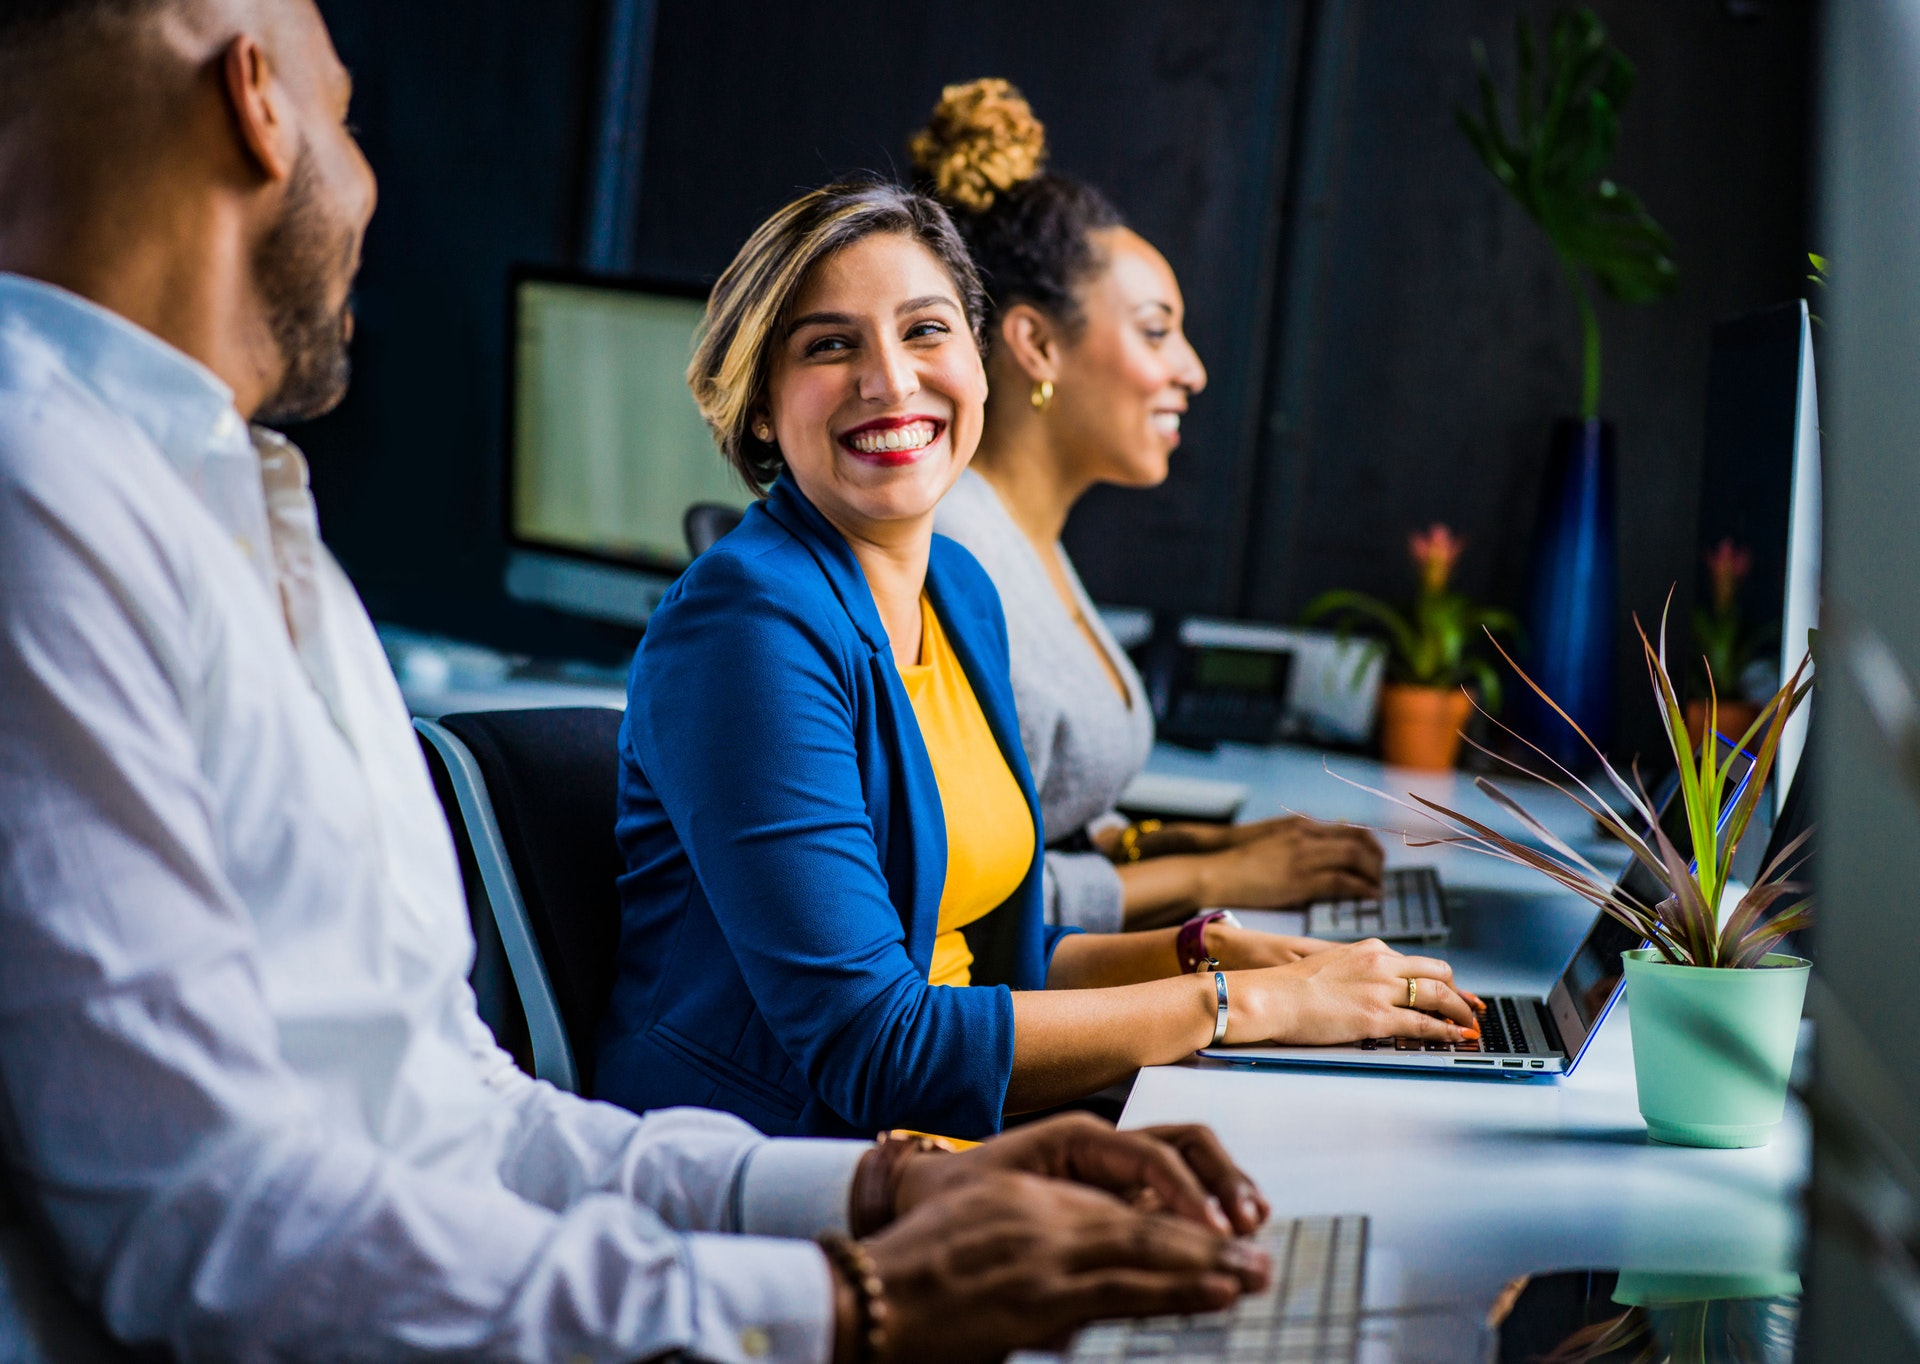 Key Leadership Skills for Business Management Careers